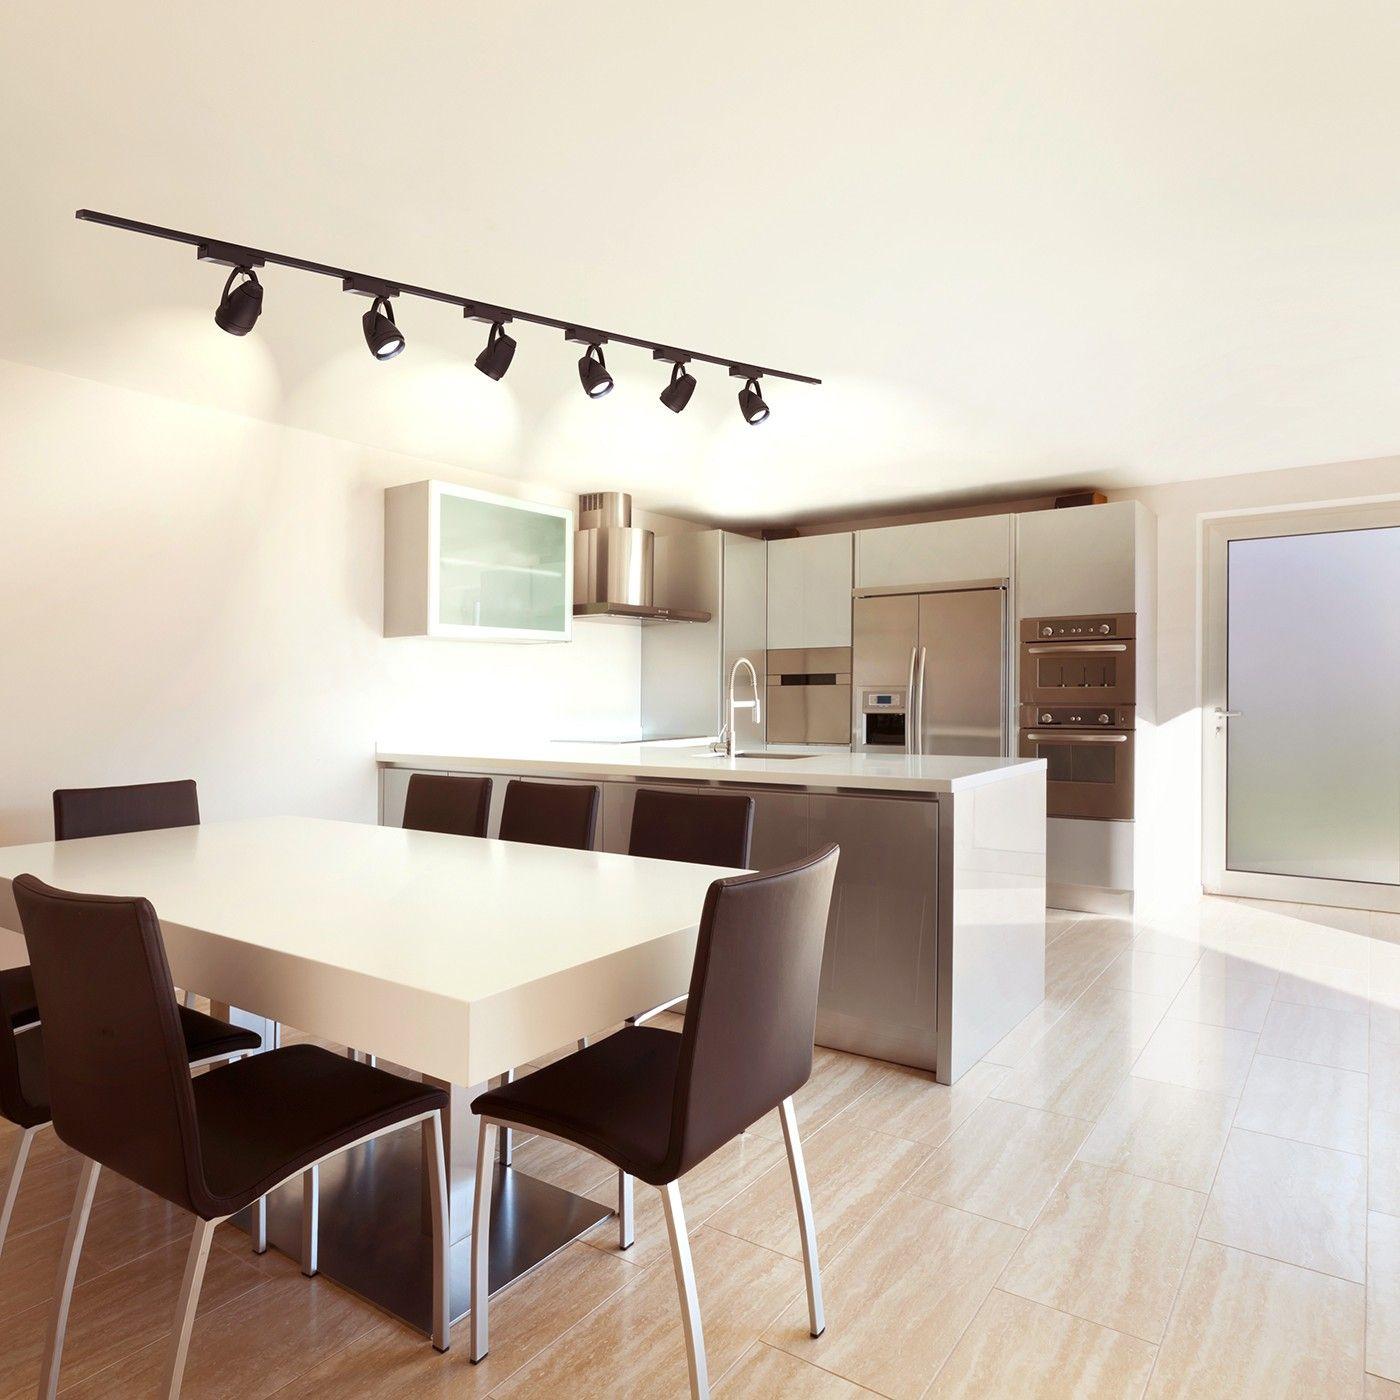 Uncategorized Office Track Lighting wilsons office 2x a150 black six light 12w led track kit kit